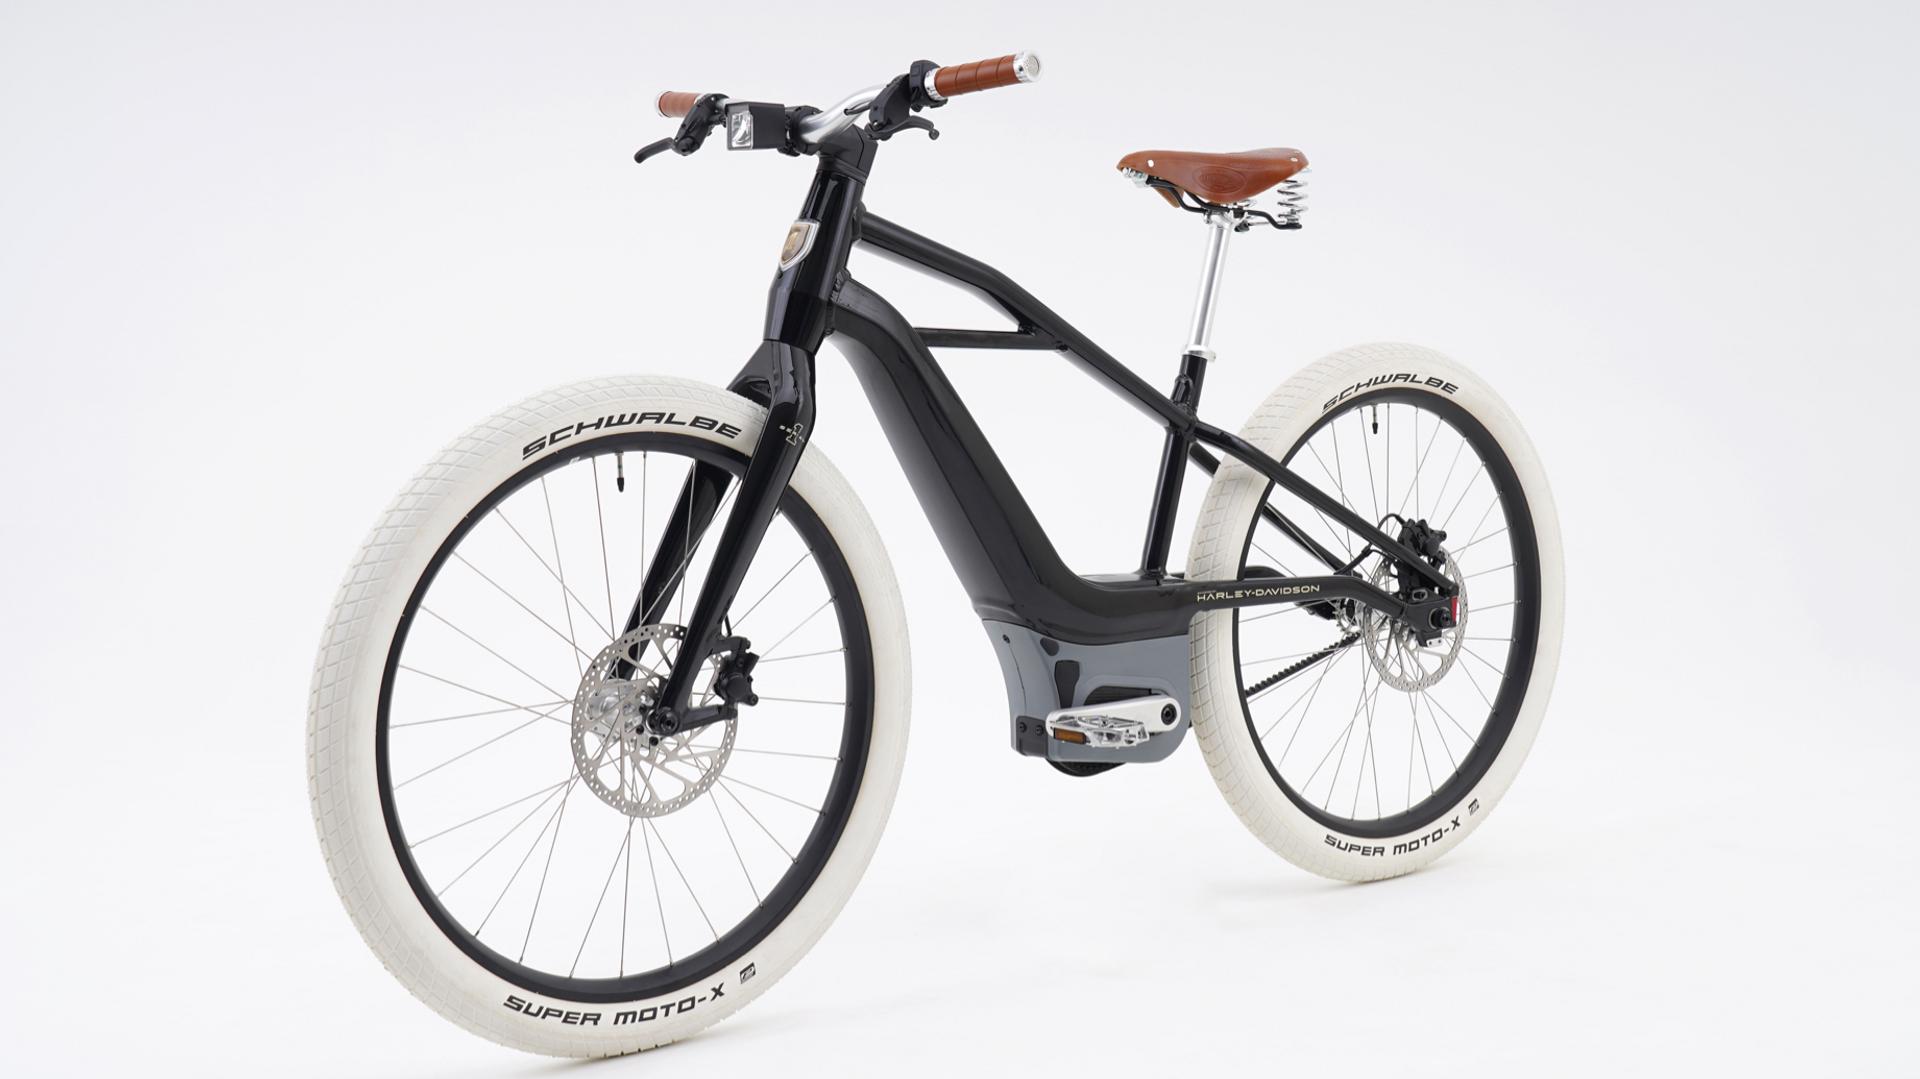 La bicicleta eléctrica Mosh/Tribute - Sputnik Mundo, 1920, 21.09.2021